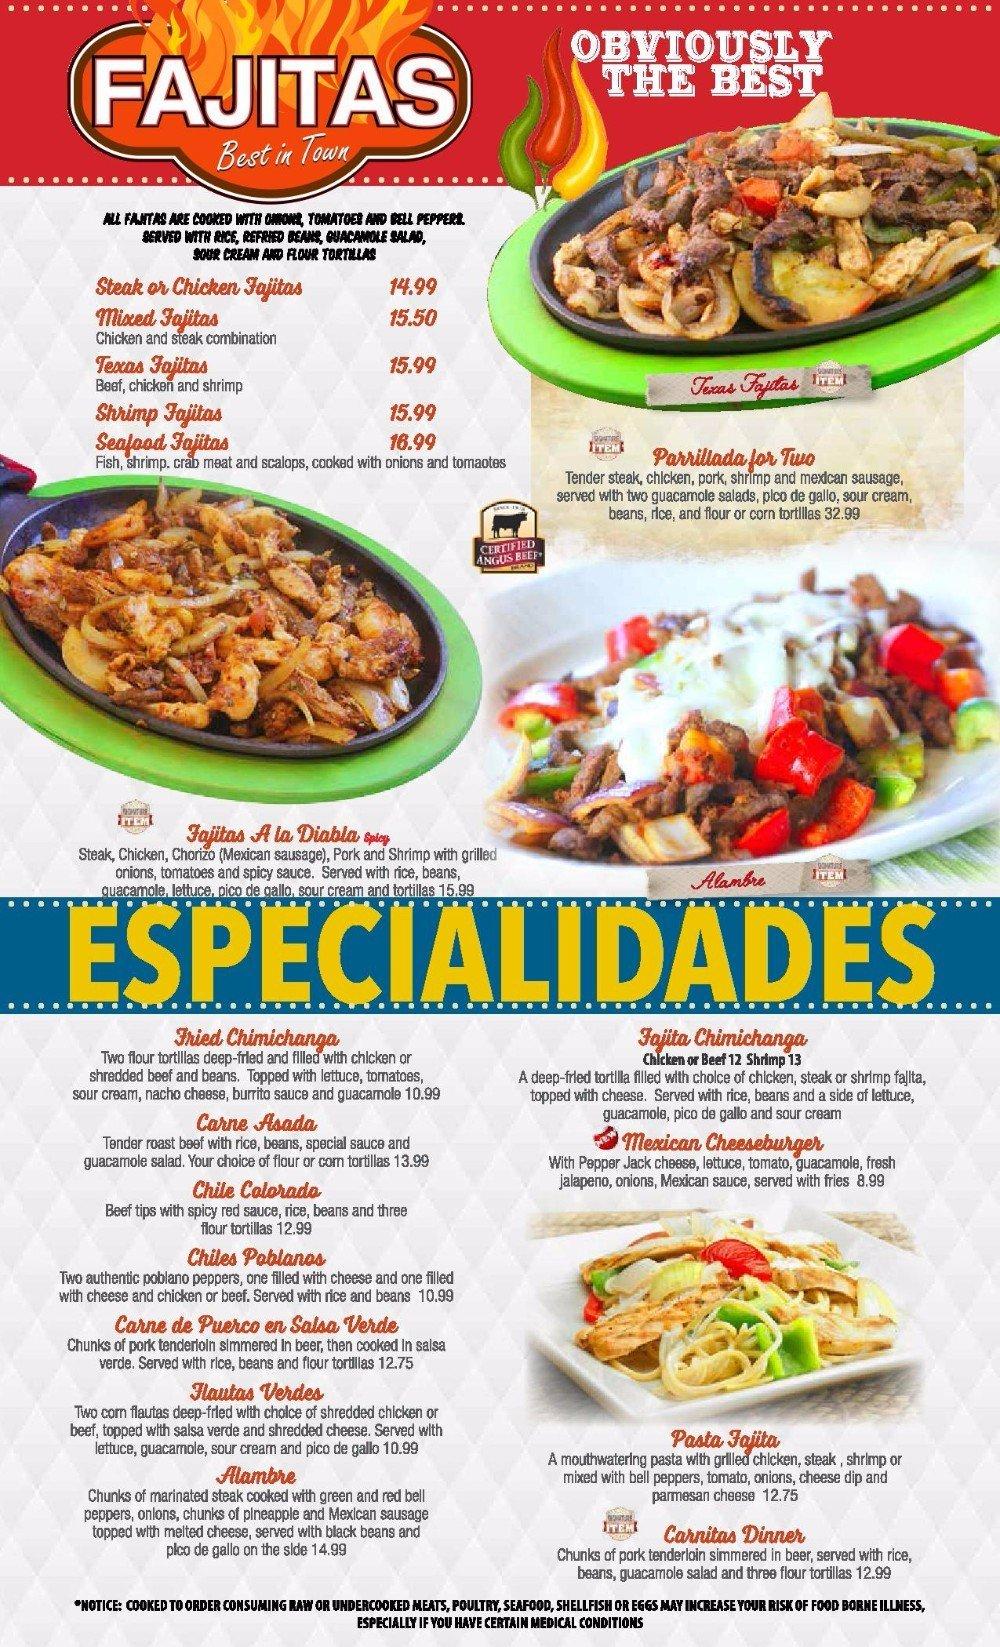 El Mariachi #2's Fajitas